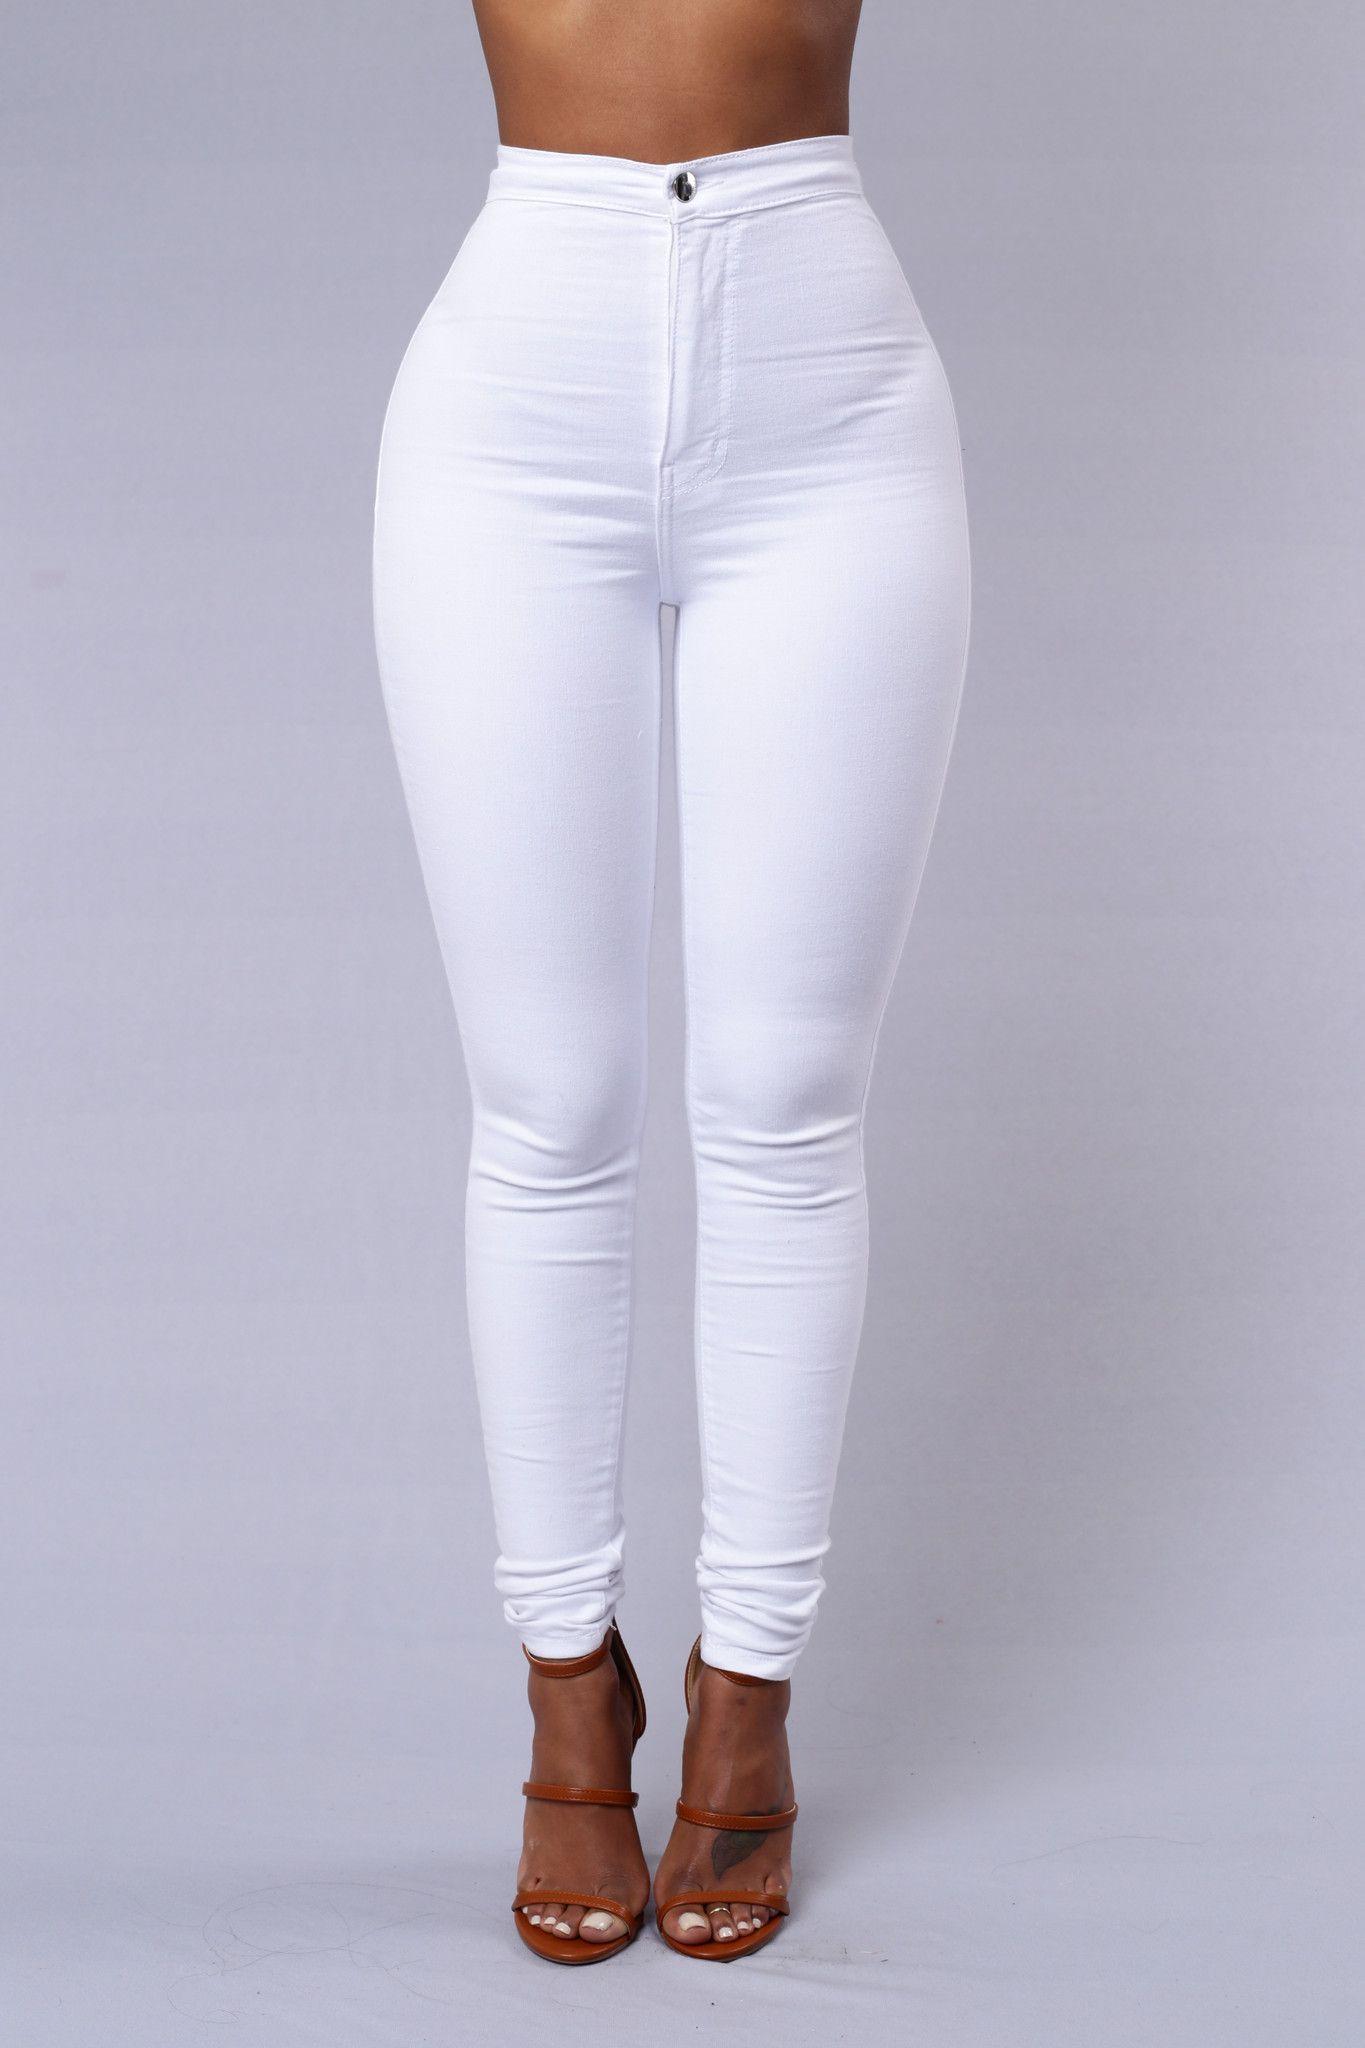 Super High Waist Denim Skinnies White High Waisted Skinny Jeans Fleece Pants Women High Jeans